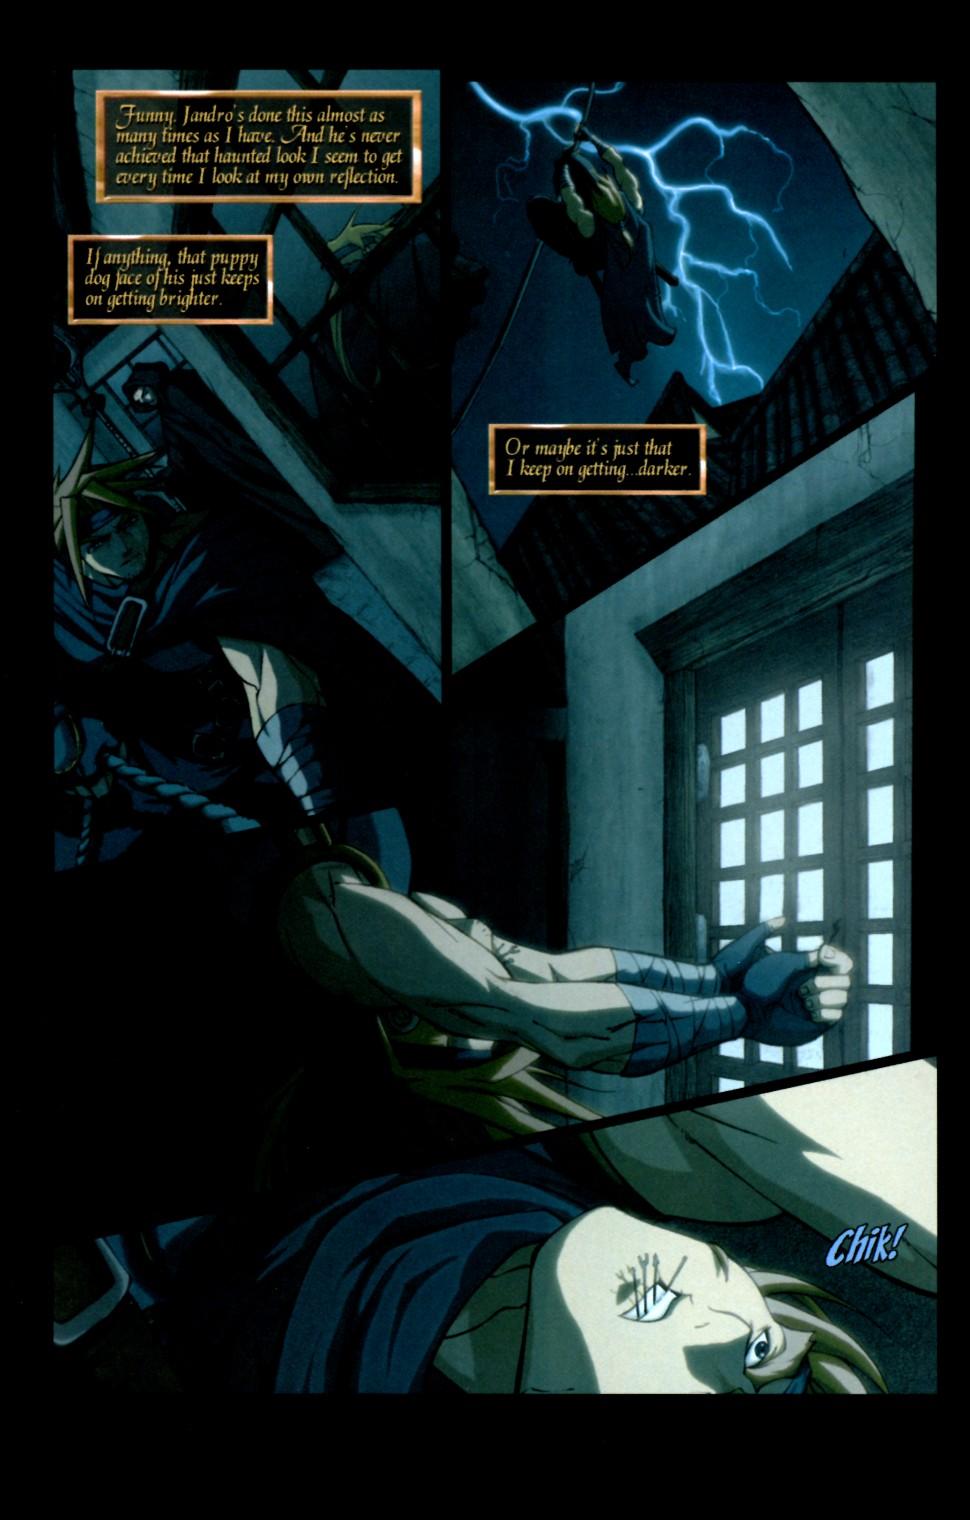 Read online Shidima comic -  Issue #0 - 5